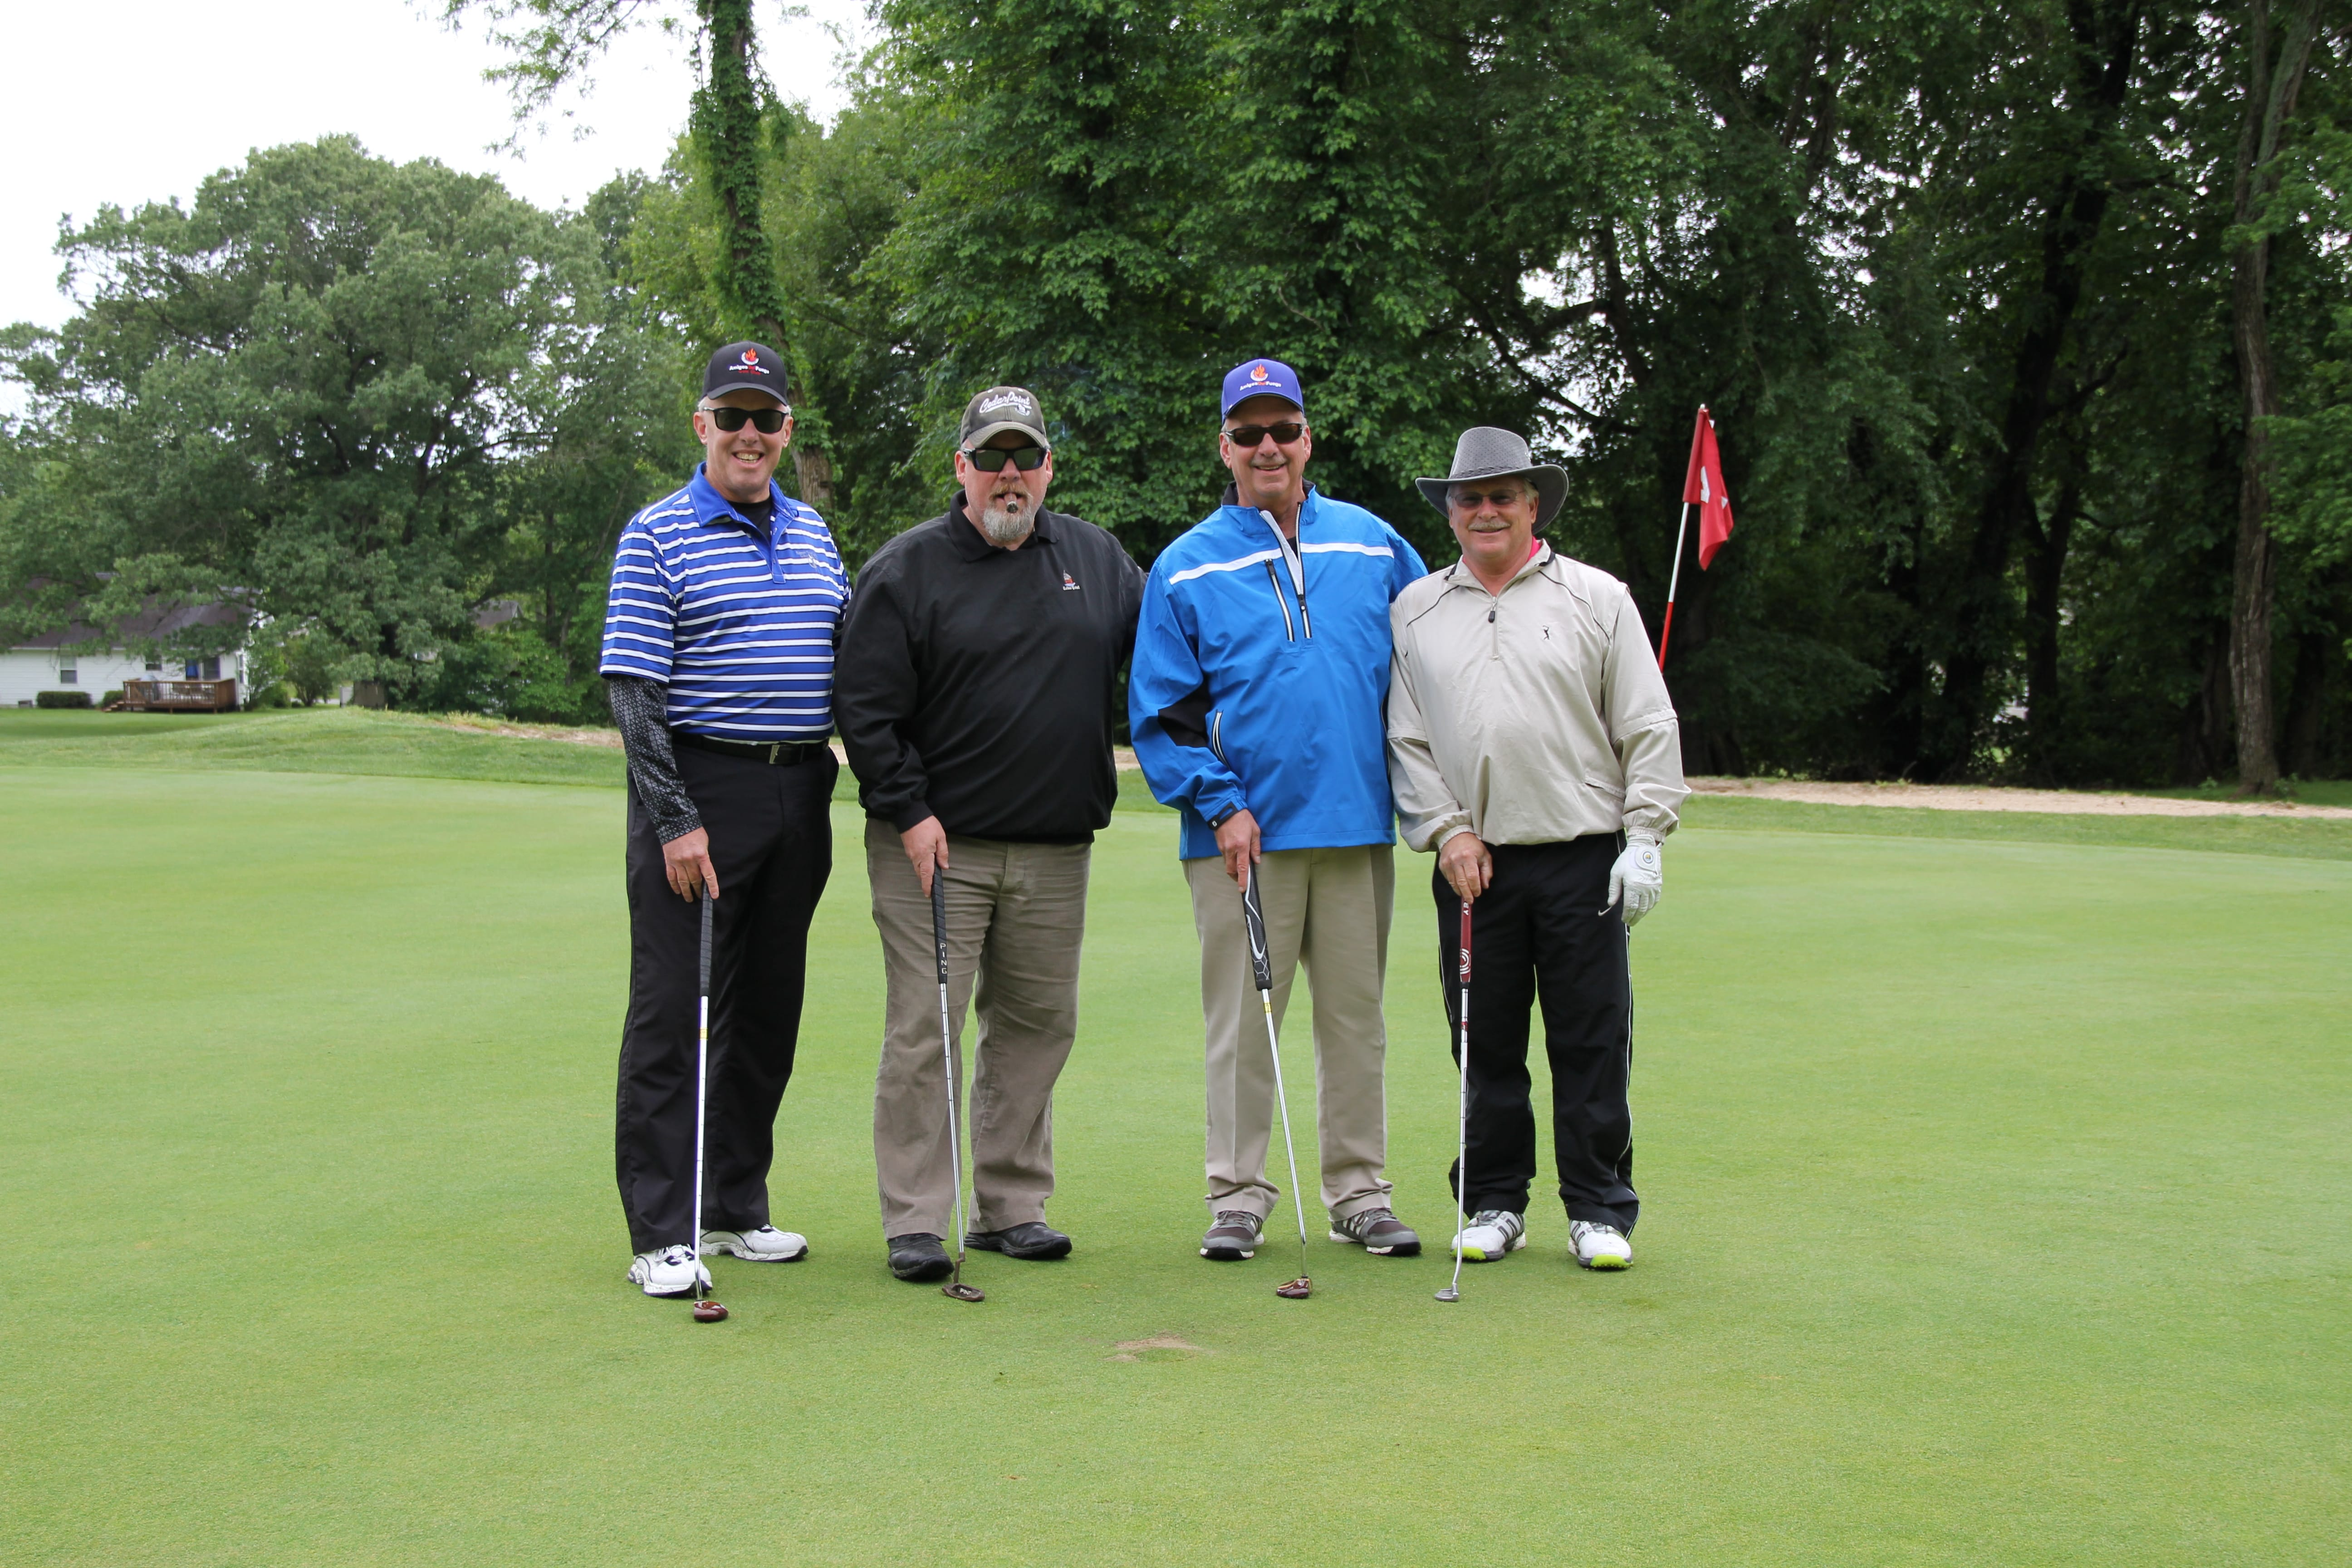 IMG_5911 - Team 6, Rick Rickson, Dave Robins, Jim Robins, Jim Gentilcore